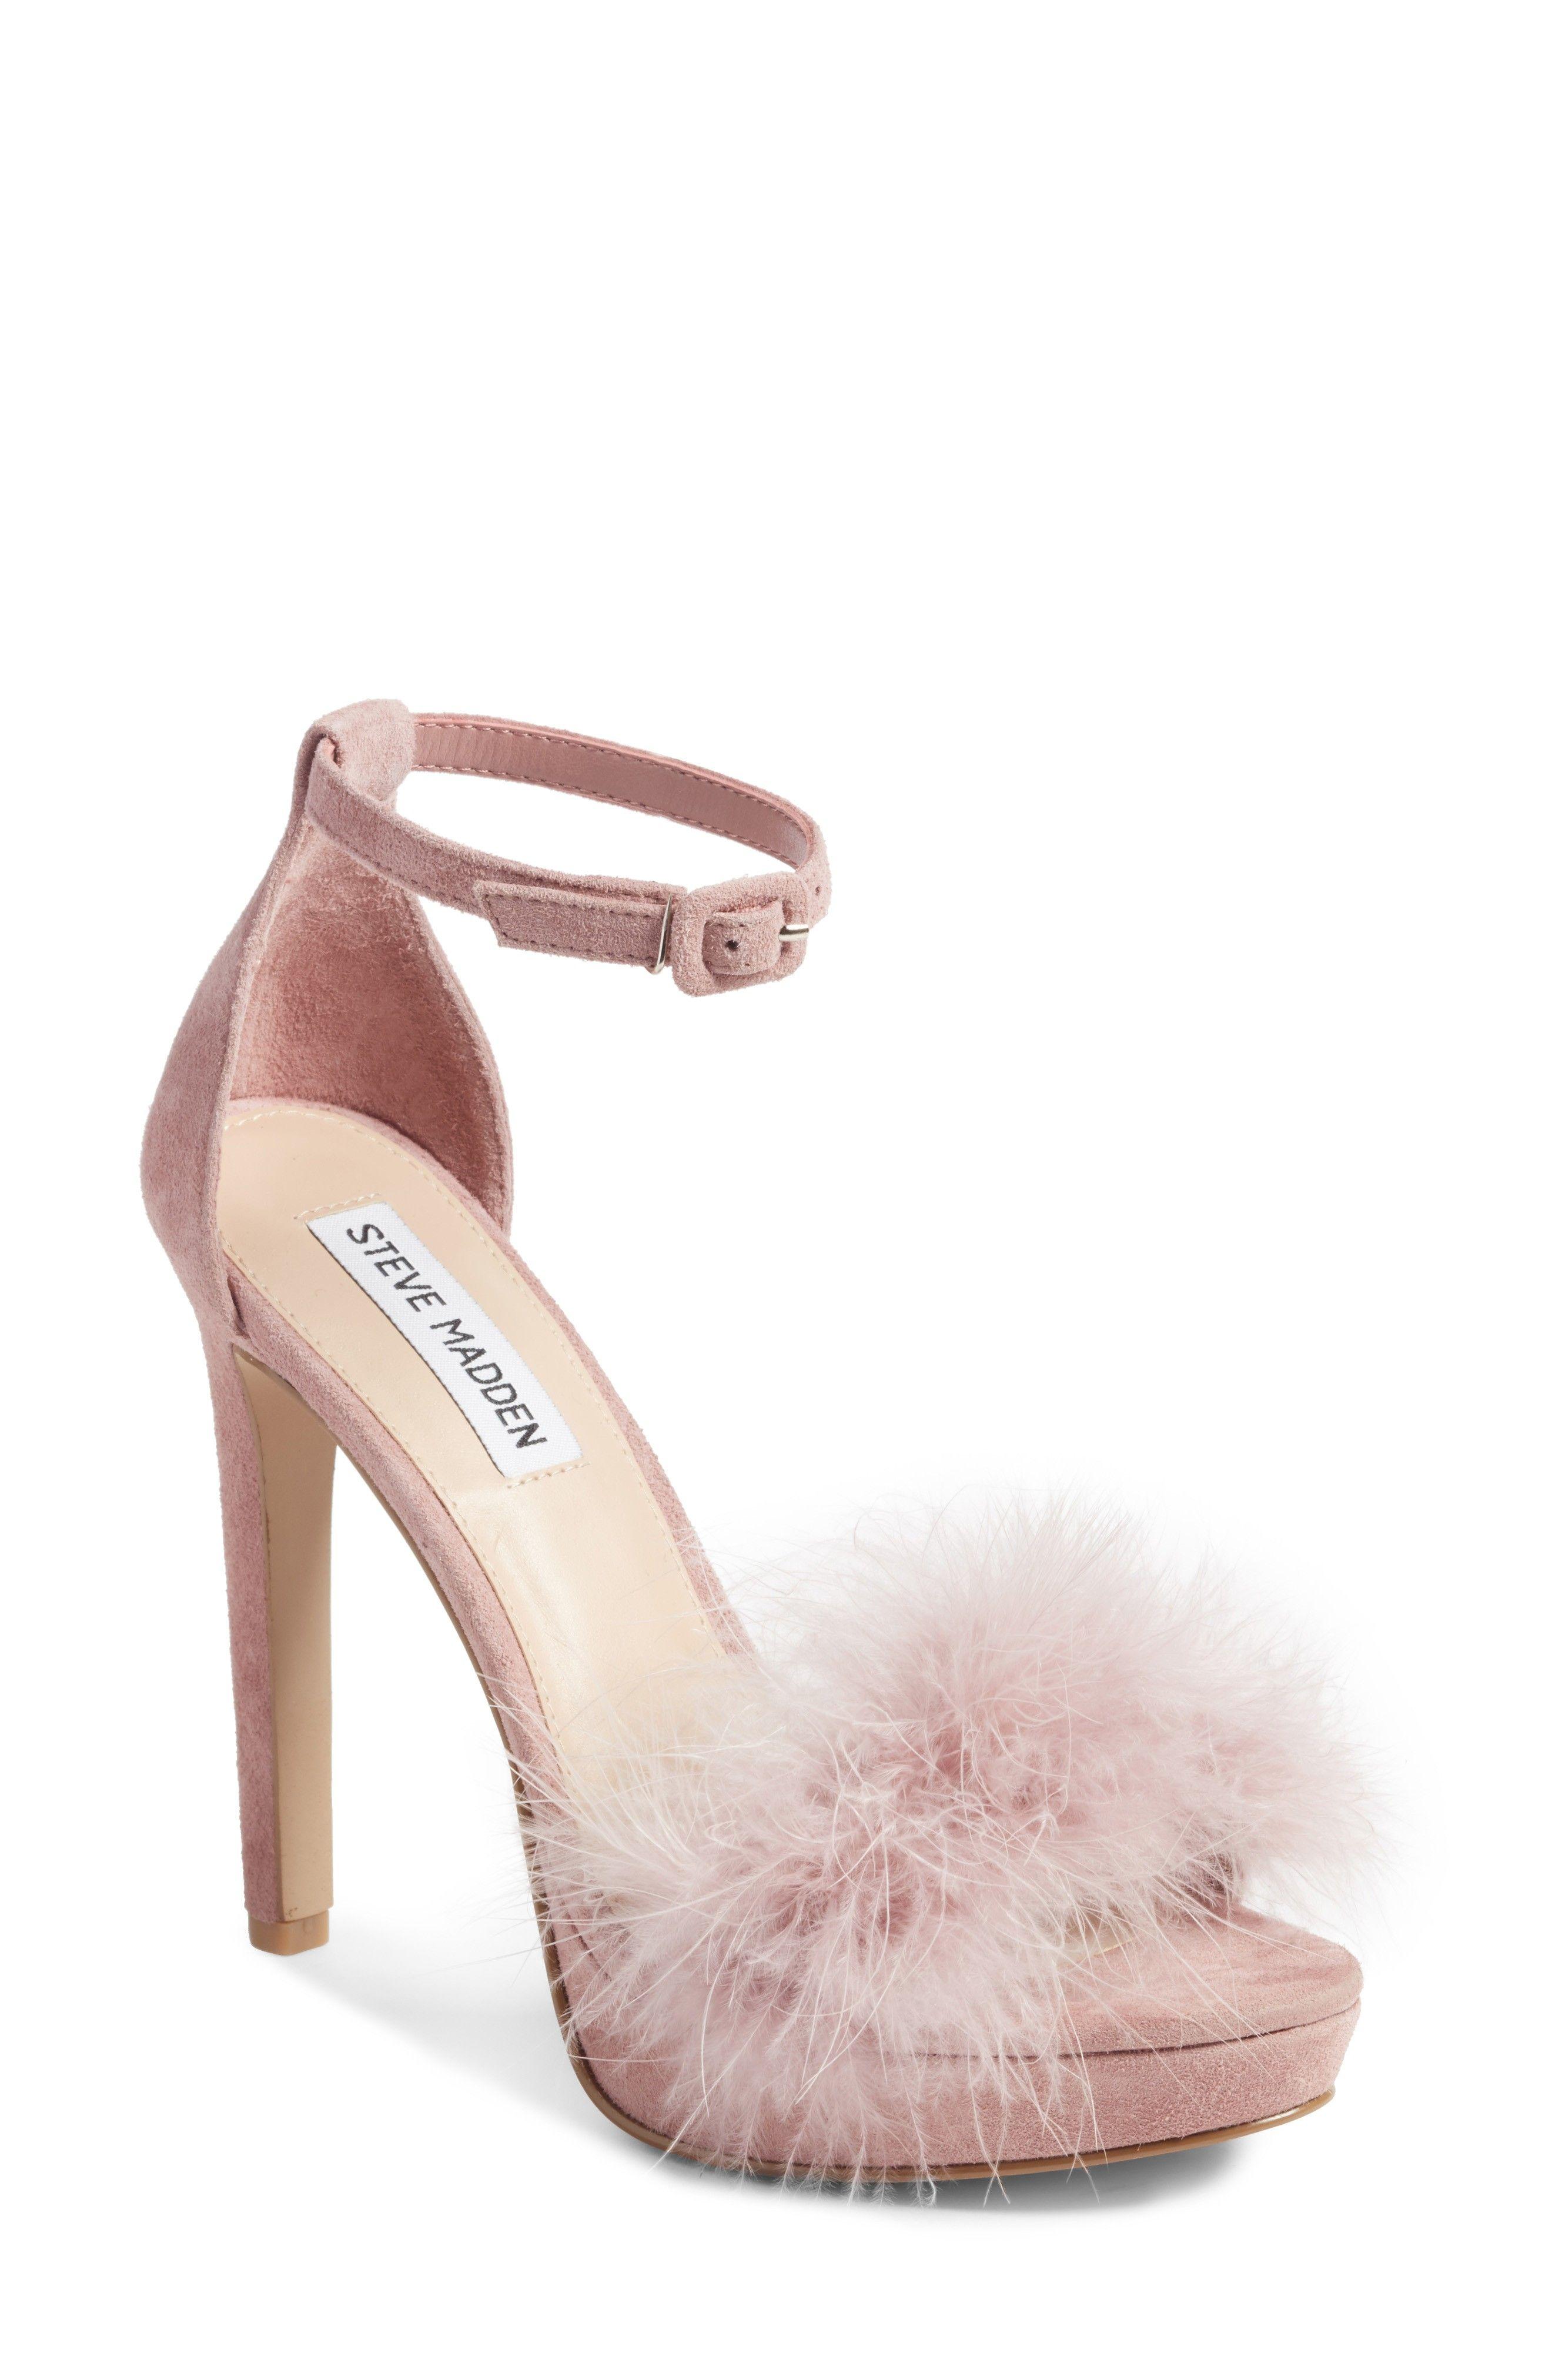 6bf5137ab45 Clutch Ankle Strap Sandal